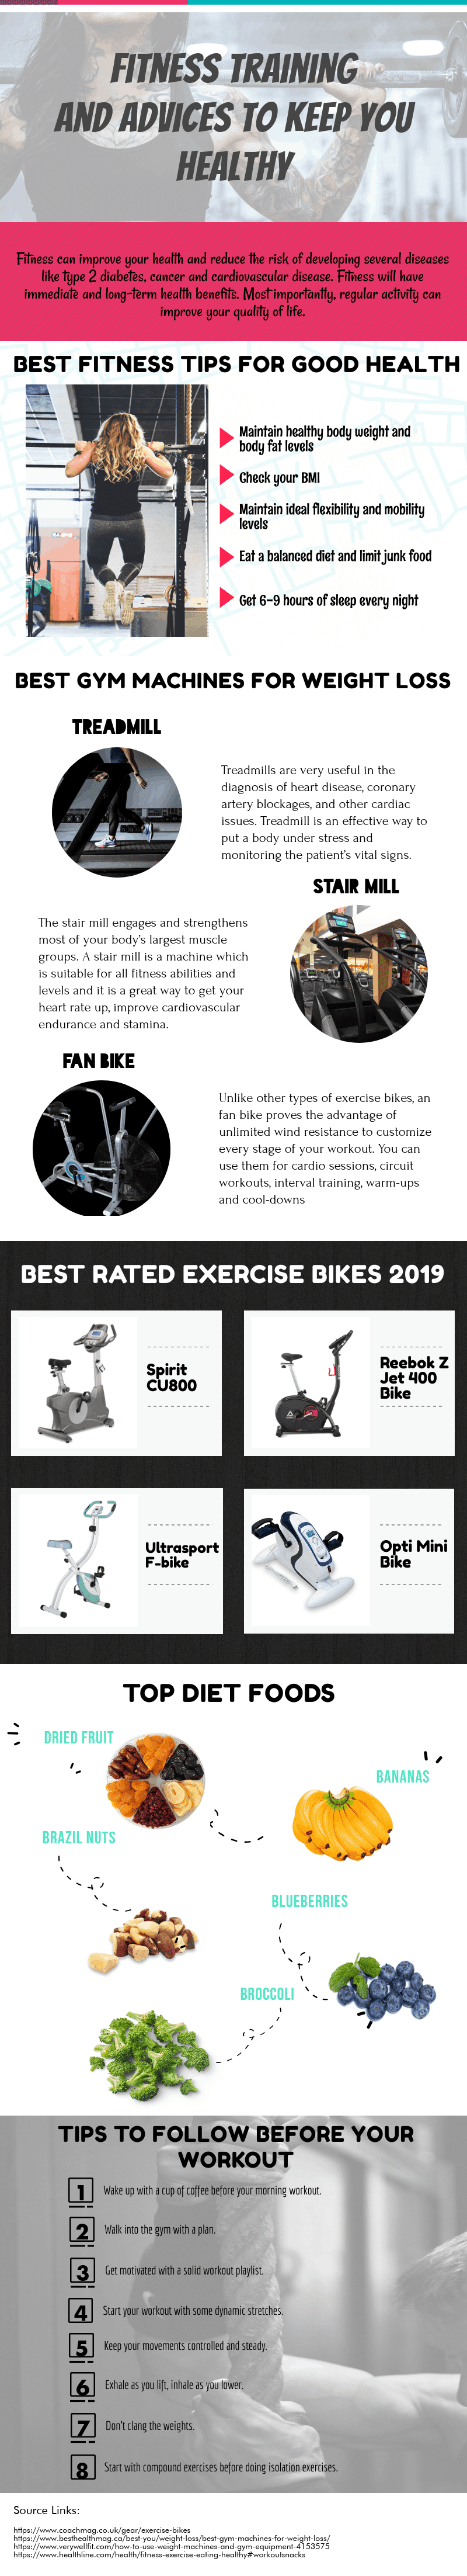 Benefits Of A Horizontal Exercise Bike